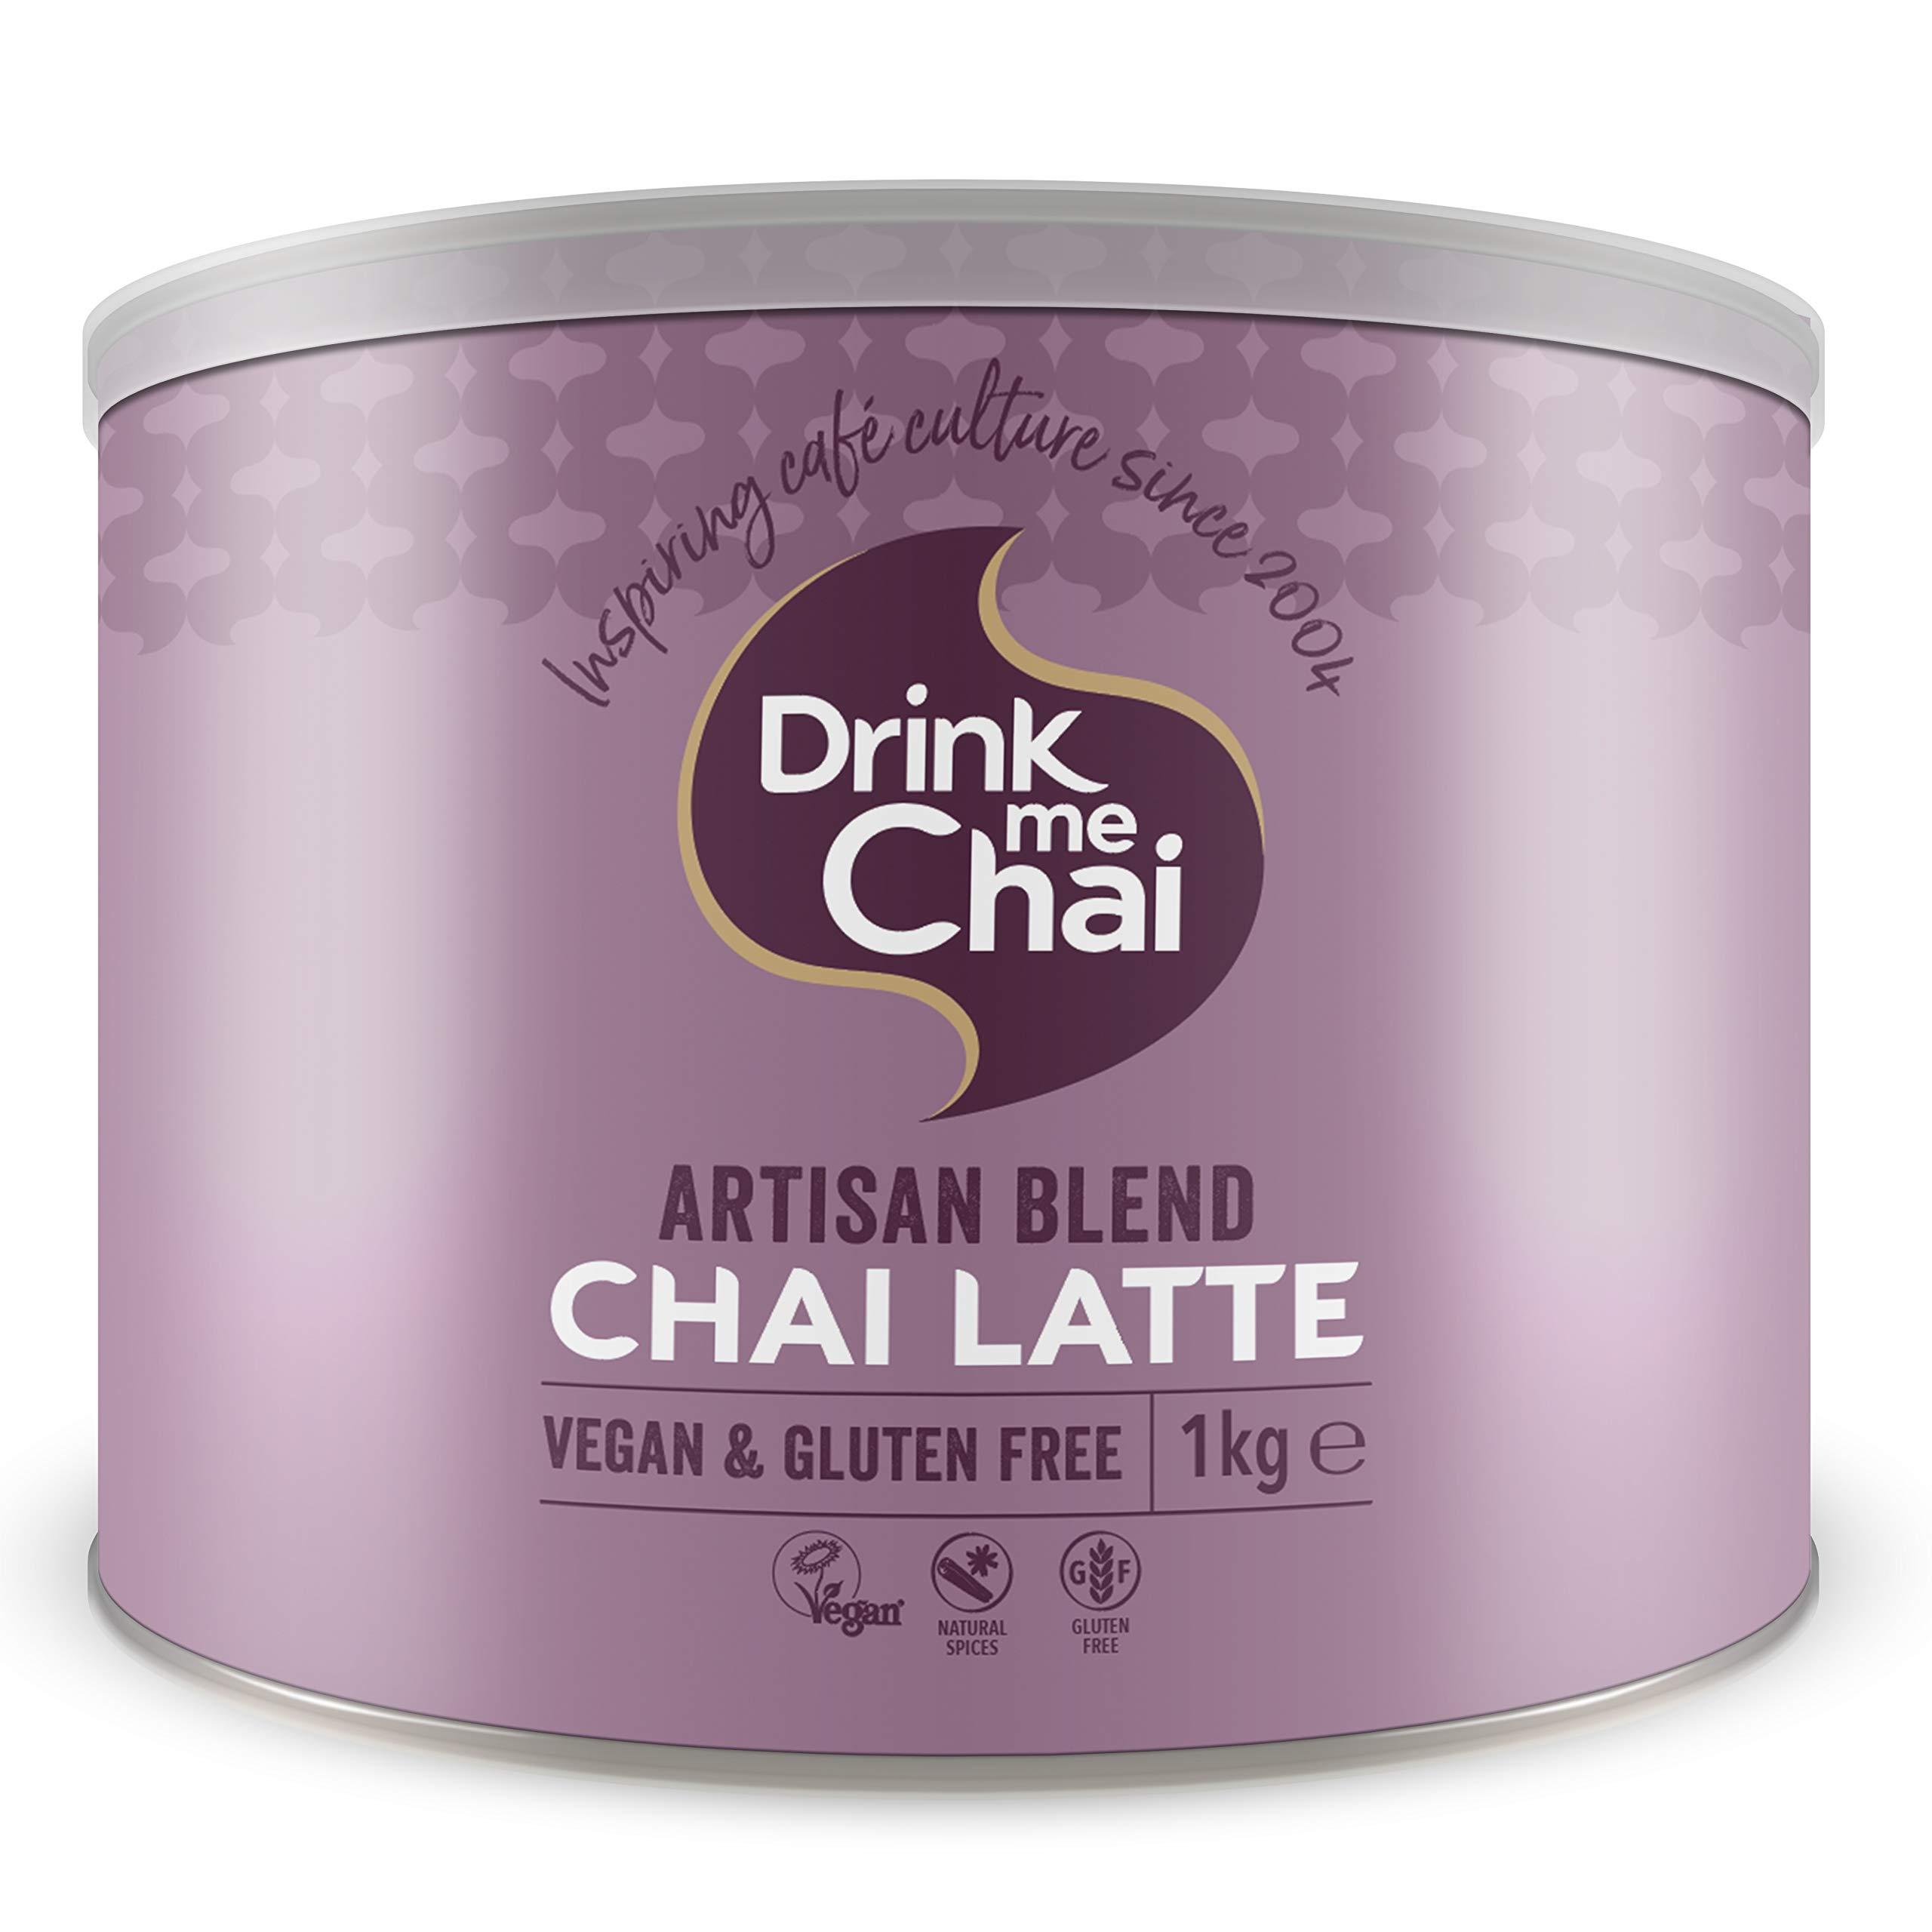 Drink me Chai Spiced Chai Latte Artisan Range 1kg